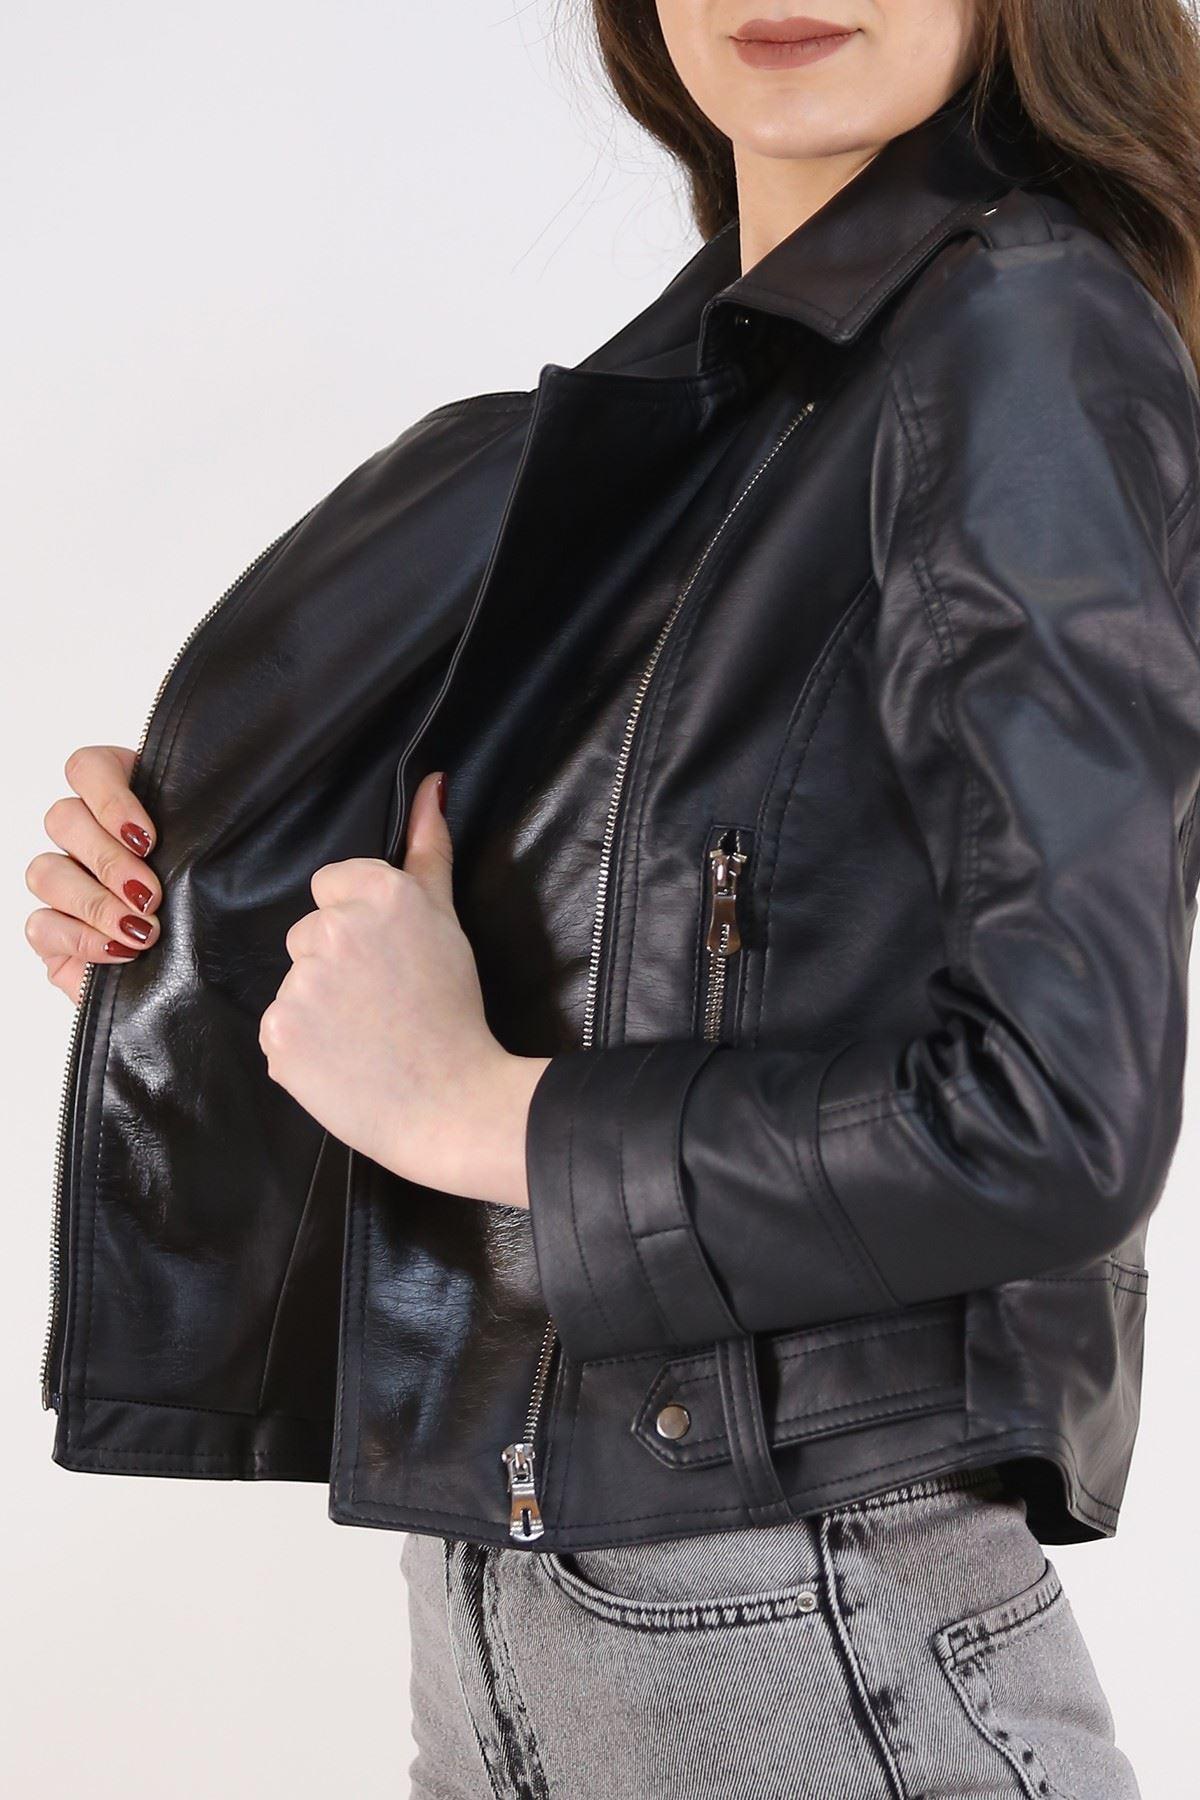 Kolu Mahşetli Deri Ceket Siyah - 1015.1368. Toptan